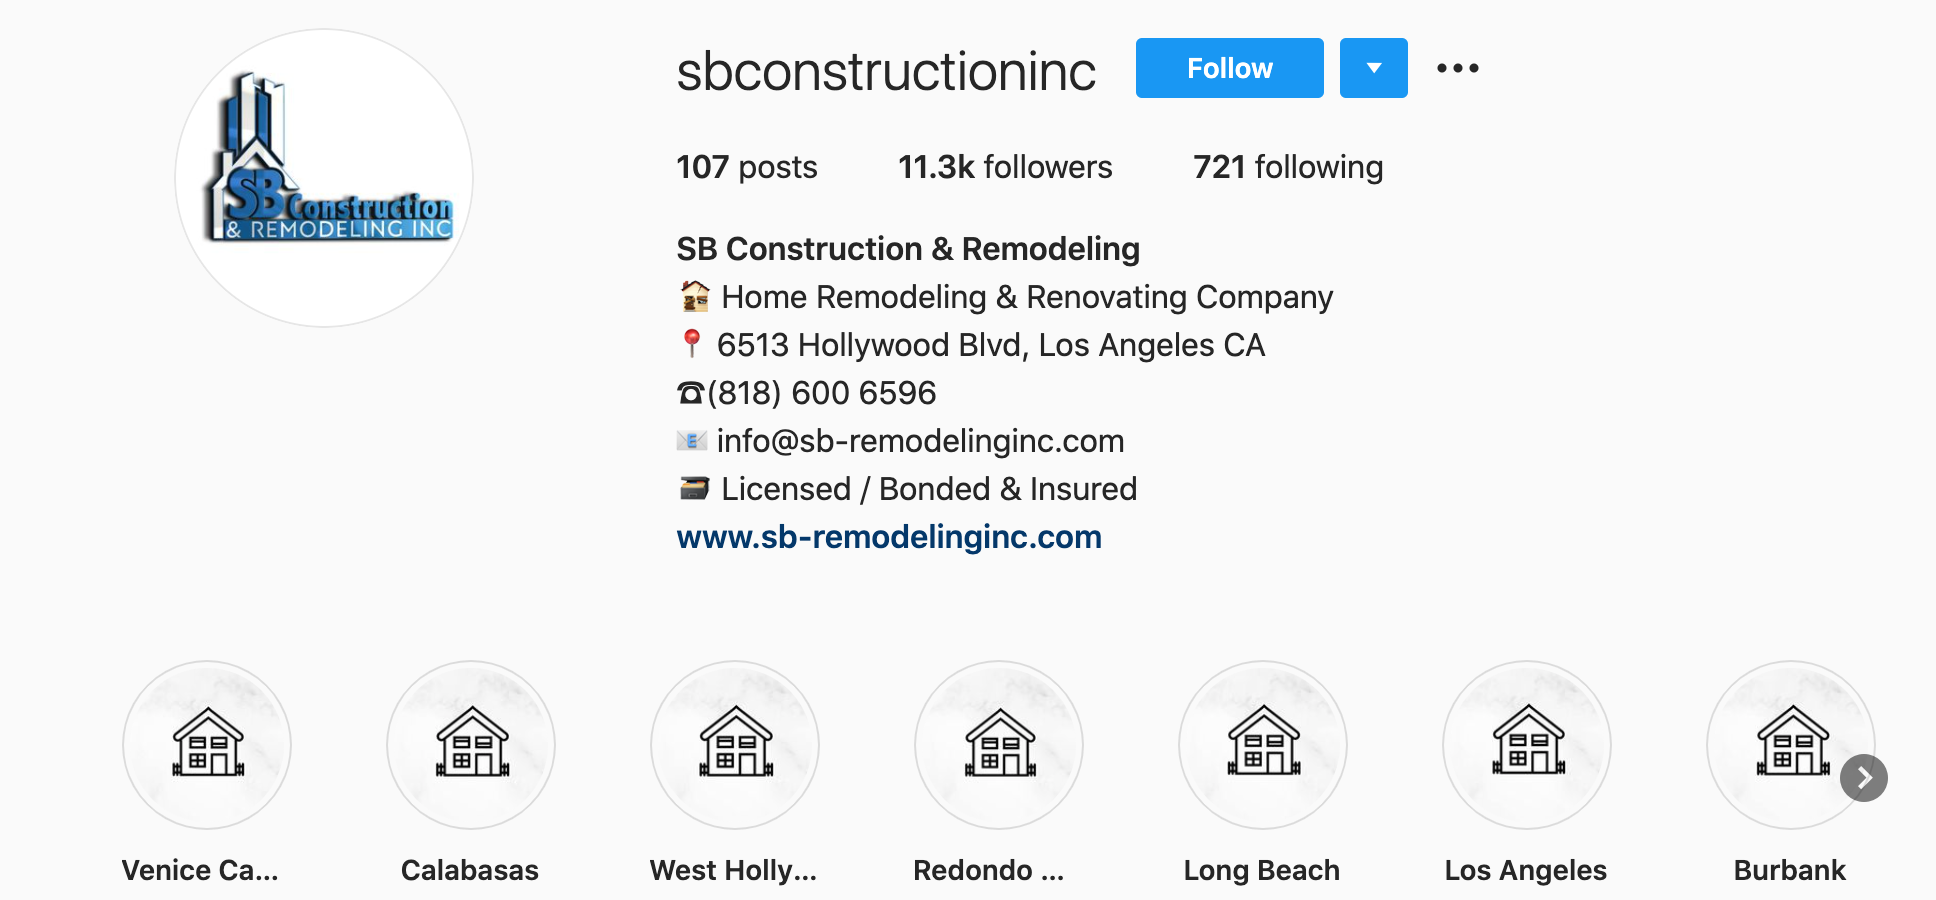 sb-construction-&-remodeling-sbconstructioninc-instagram-profile